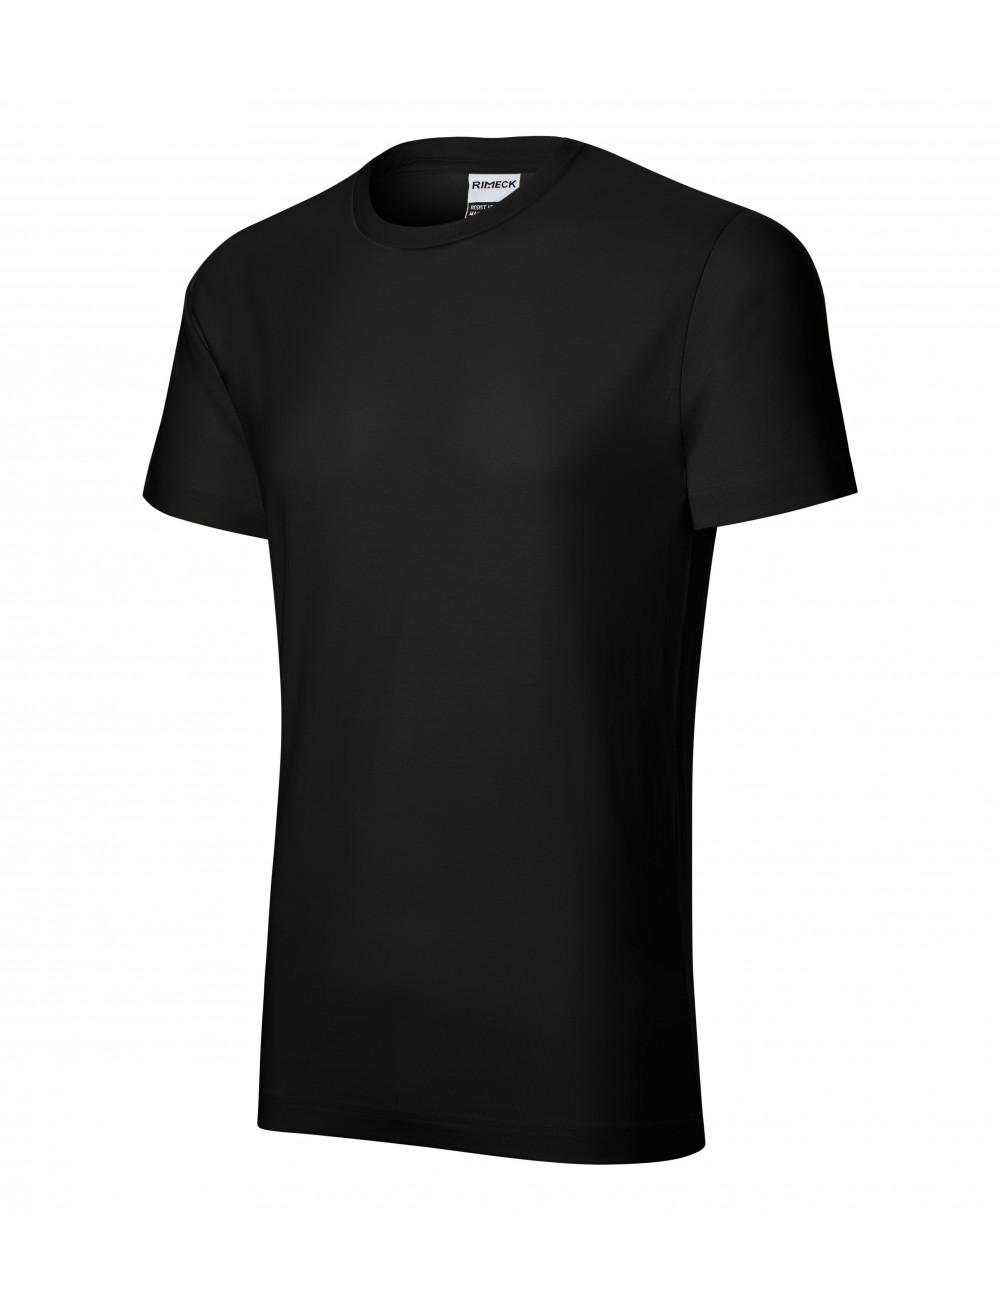 Adler RIMECK Koszulka męska Resist R01 czarny